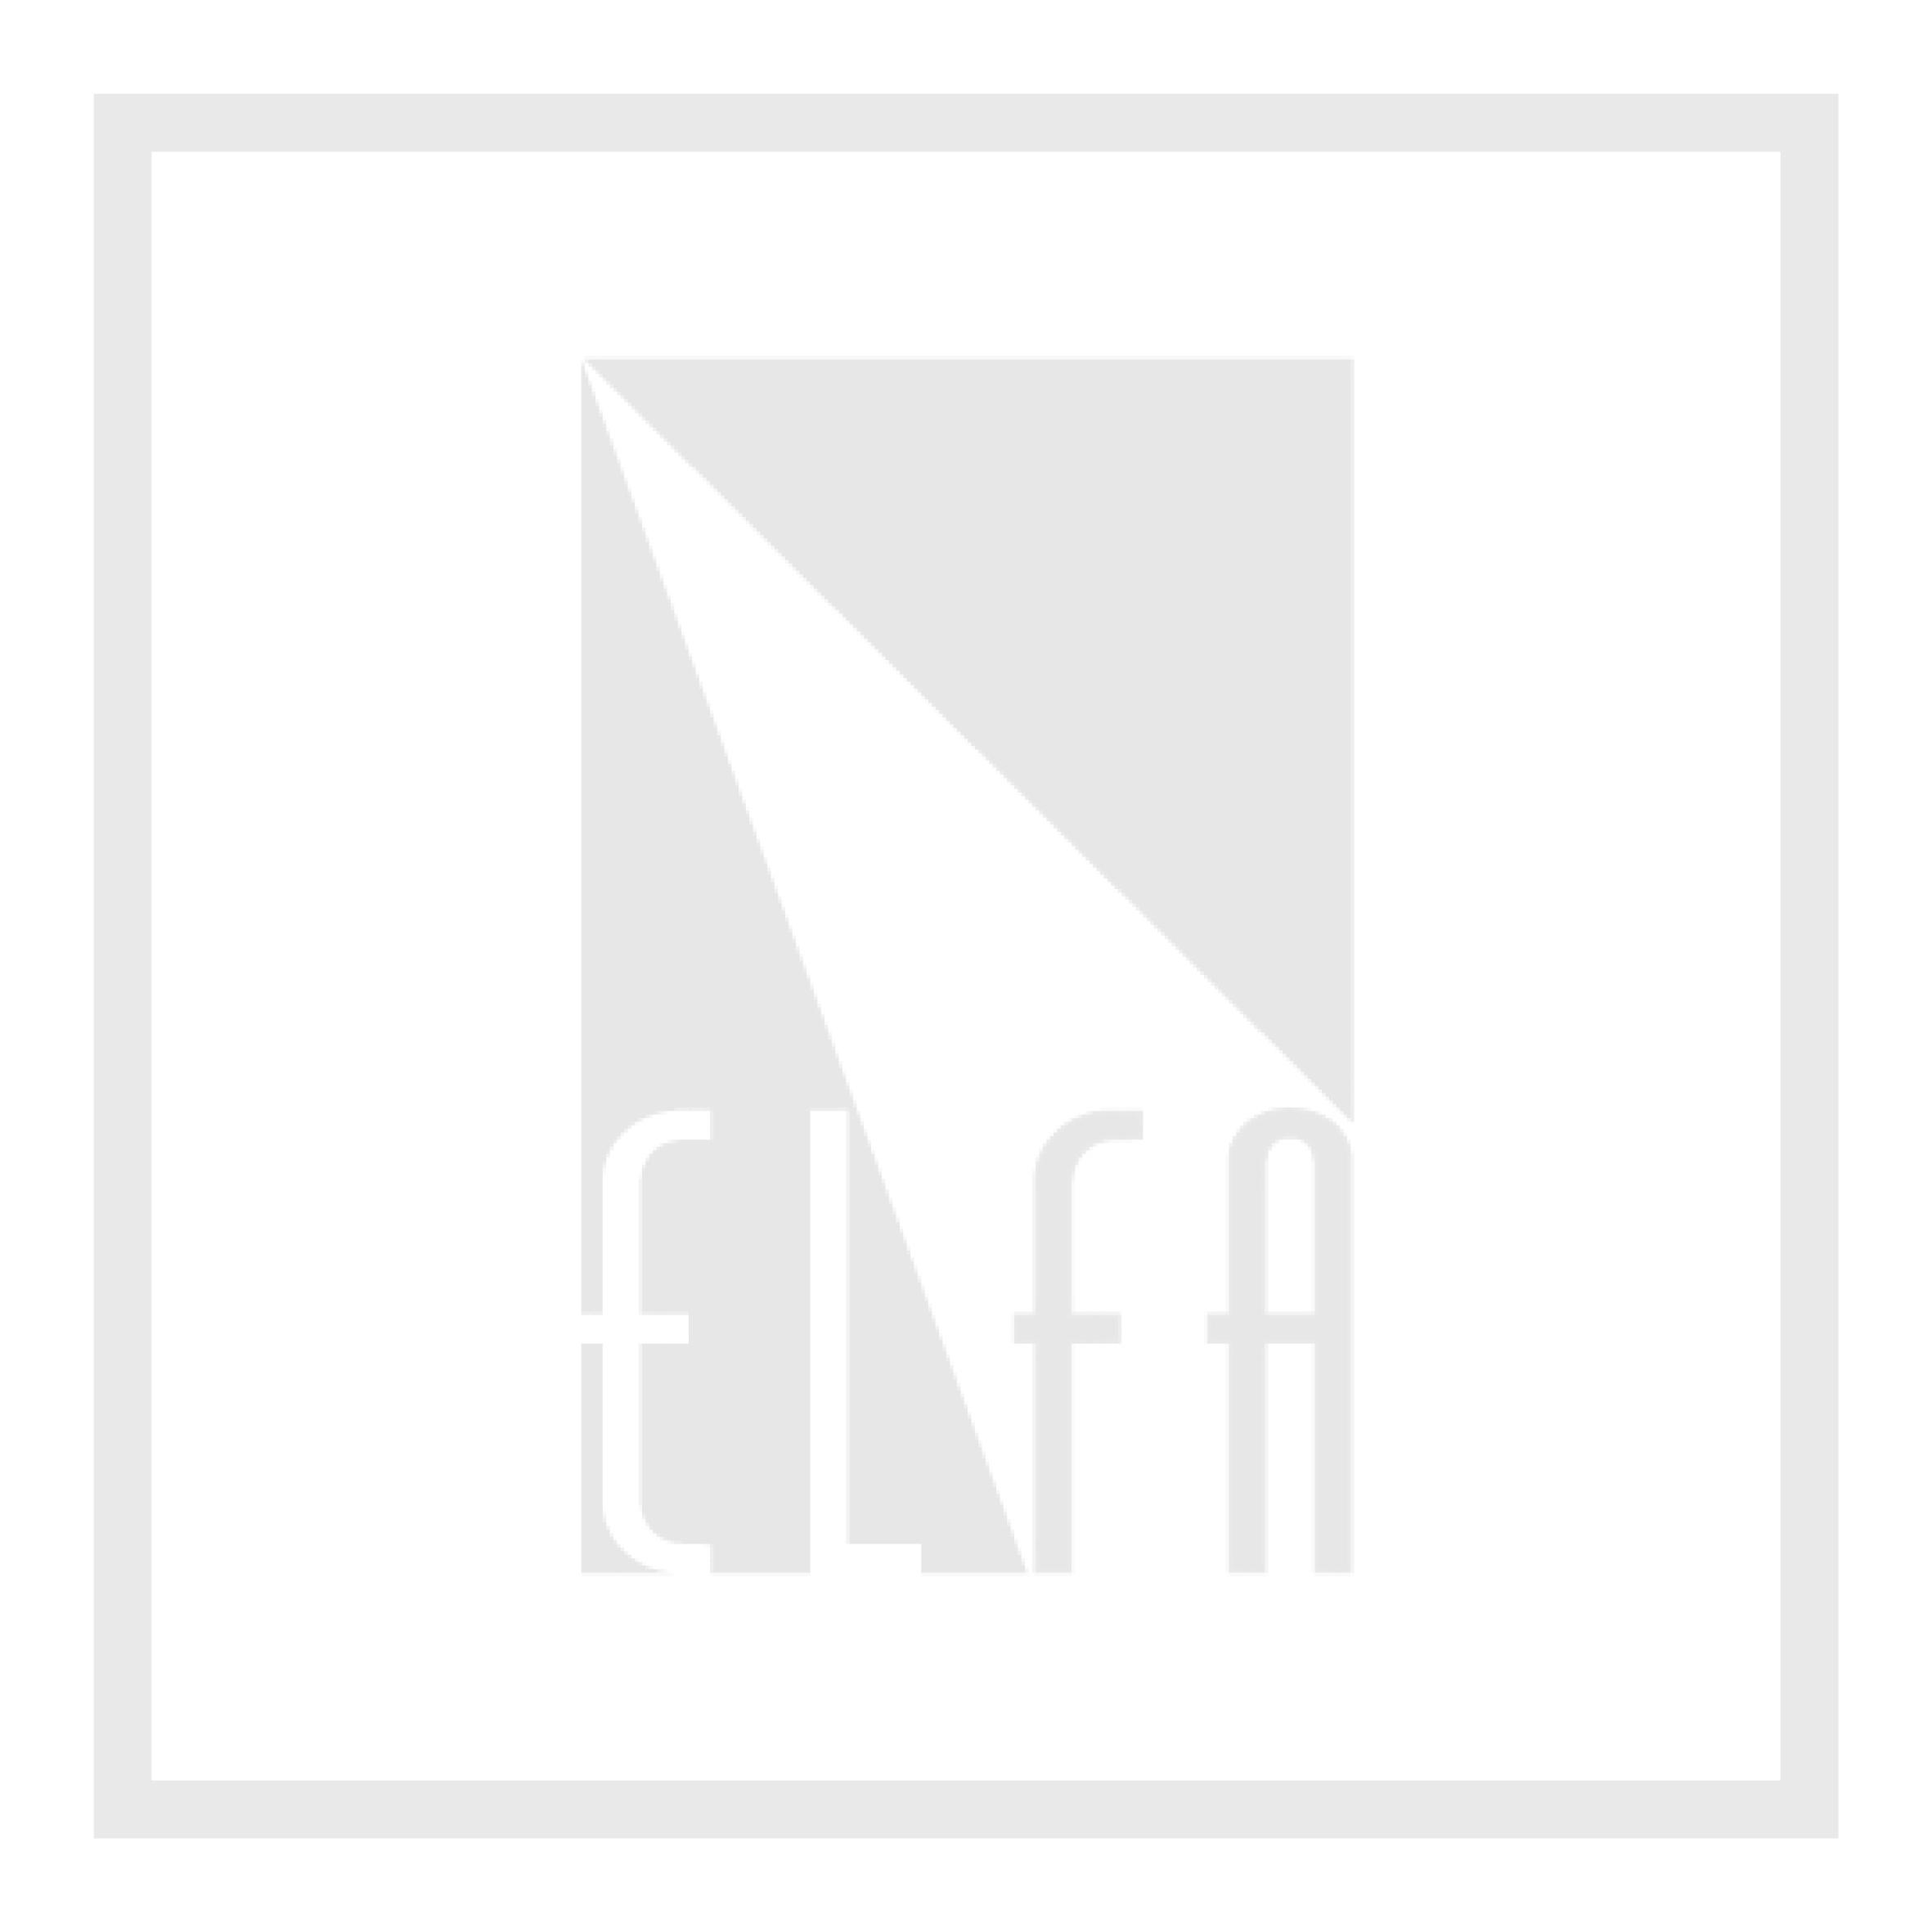 Maglite NiMH batt packpack MagCharger private label 3500mAh